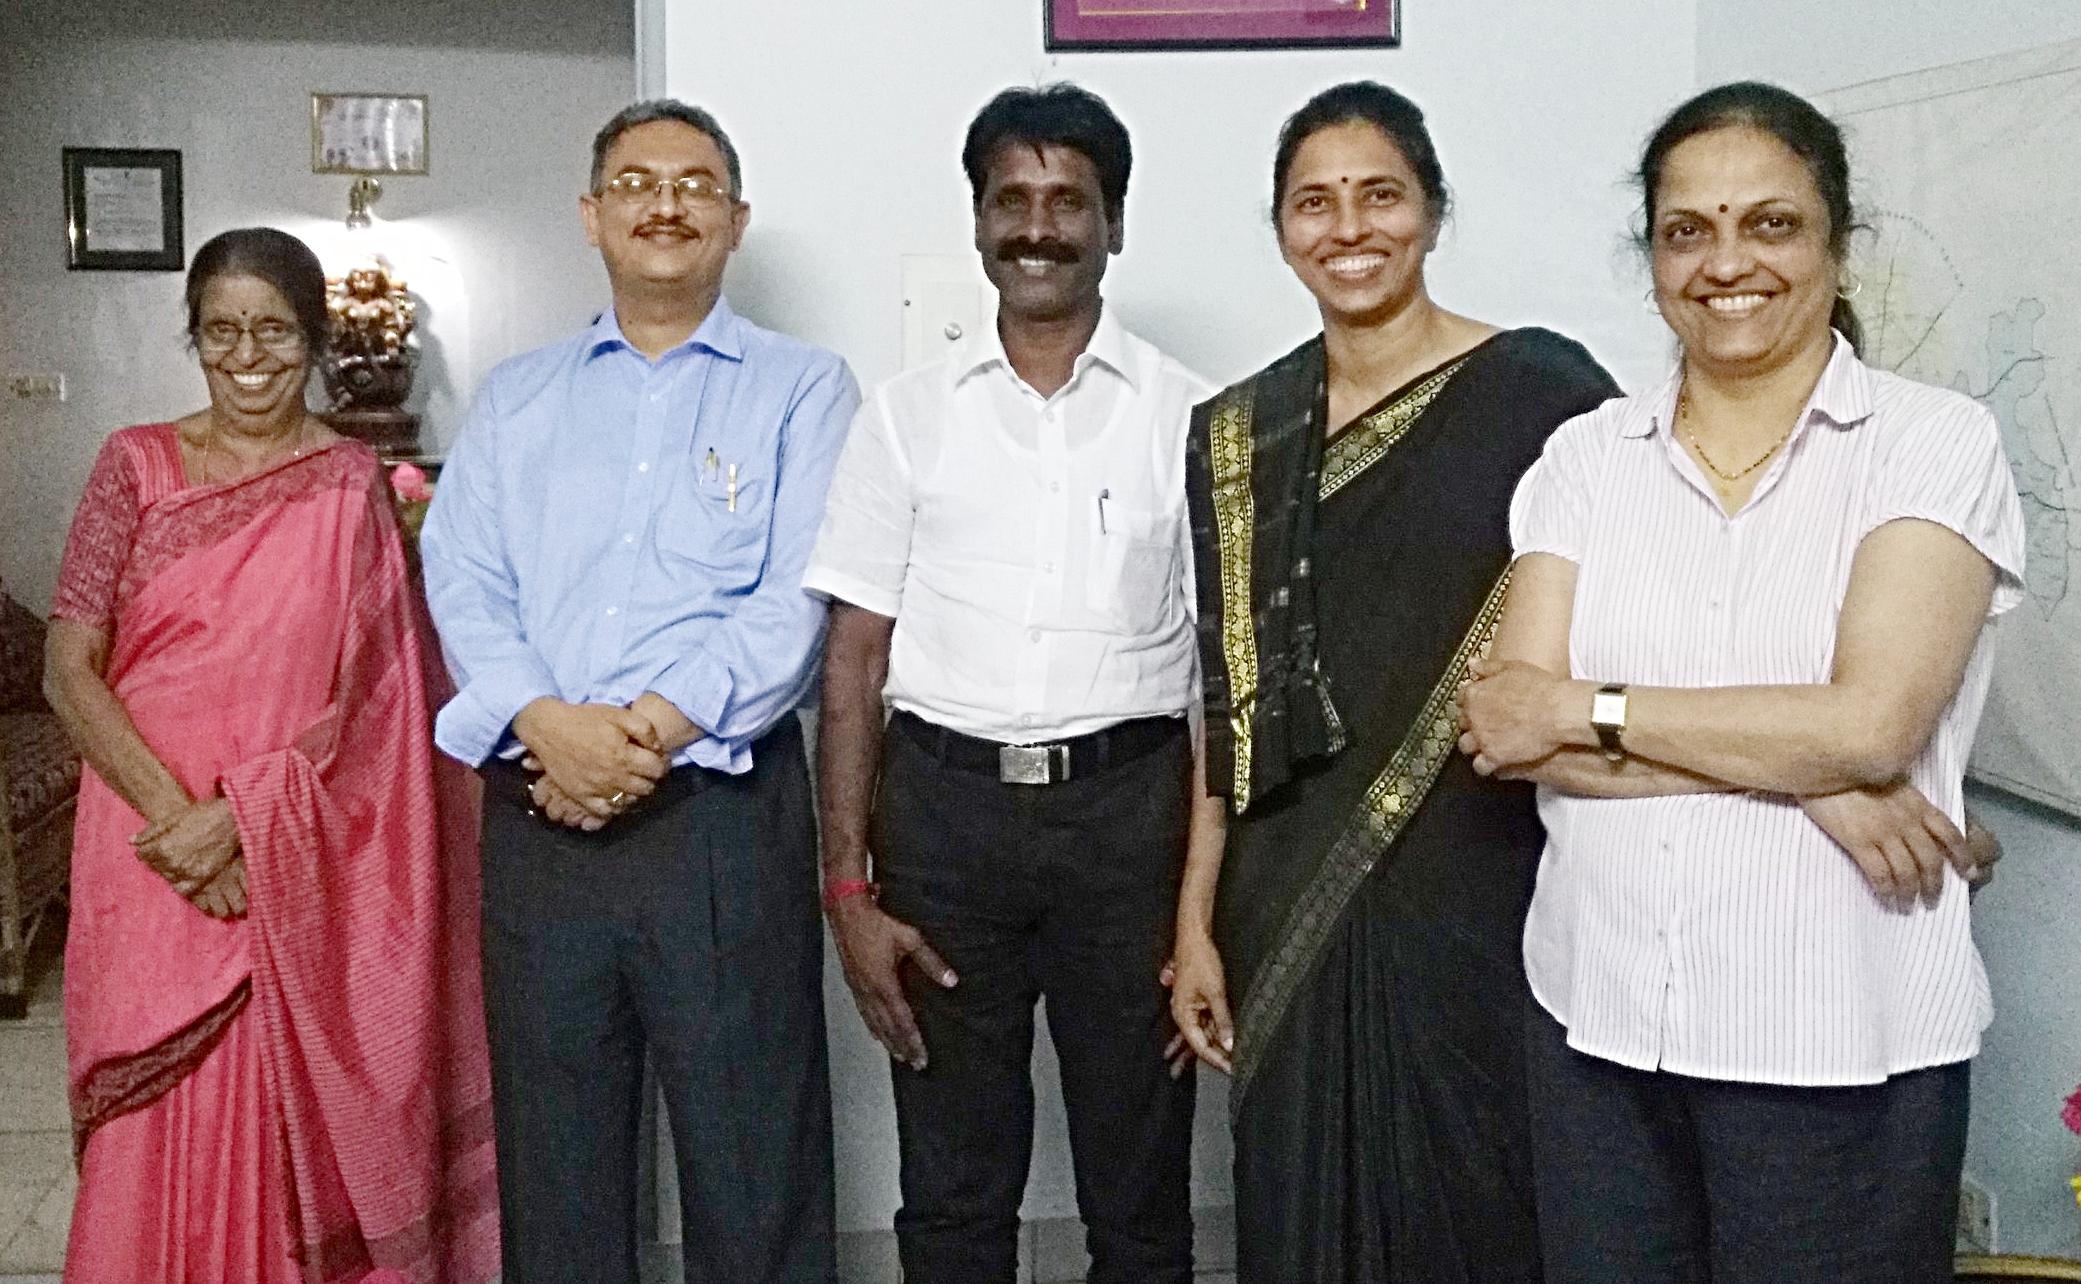 From Left to Right: Dr.Indira Ramarao - Trustee, Dr.Mahesh - Trustee, Dr.Selvam Durai -Trustee, Dr.Purnima Madhivanan - Founder Trustee, Dr.Anajli Arun - Managing Trustee